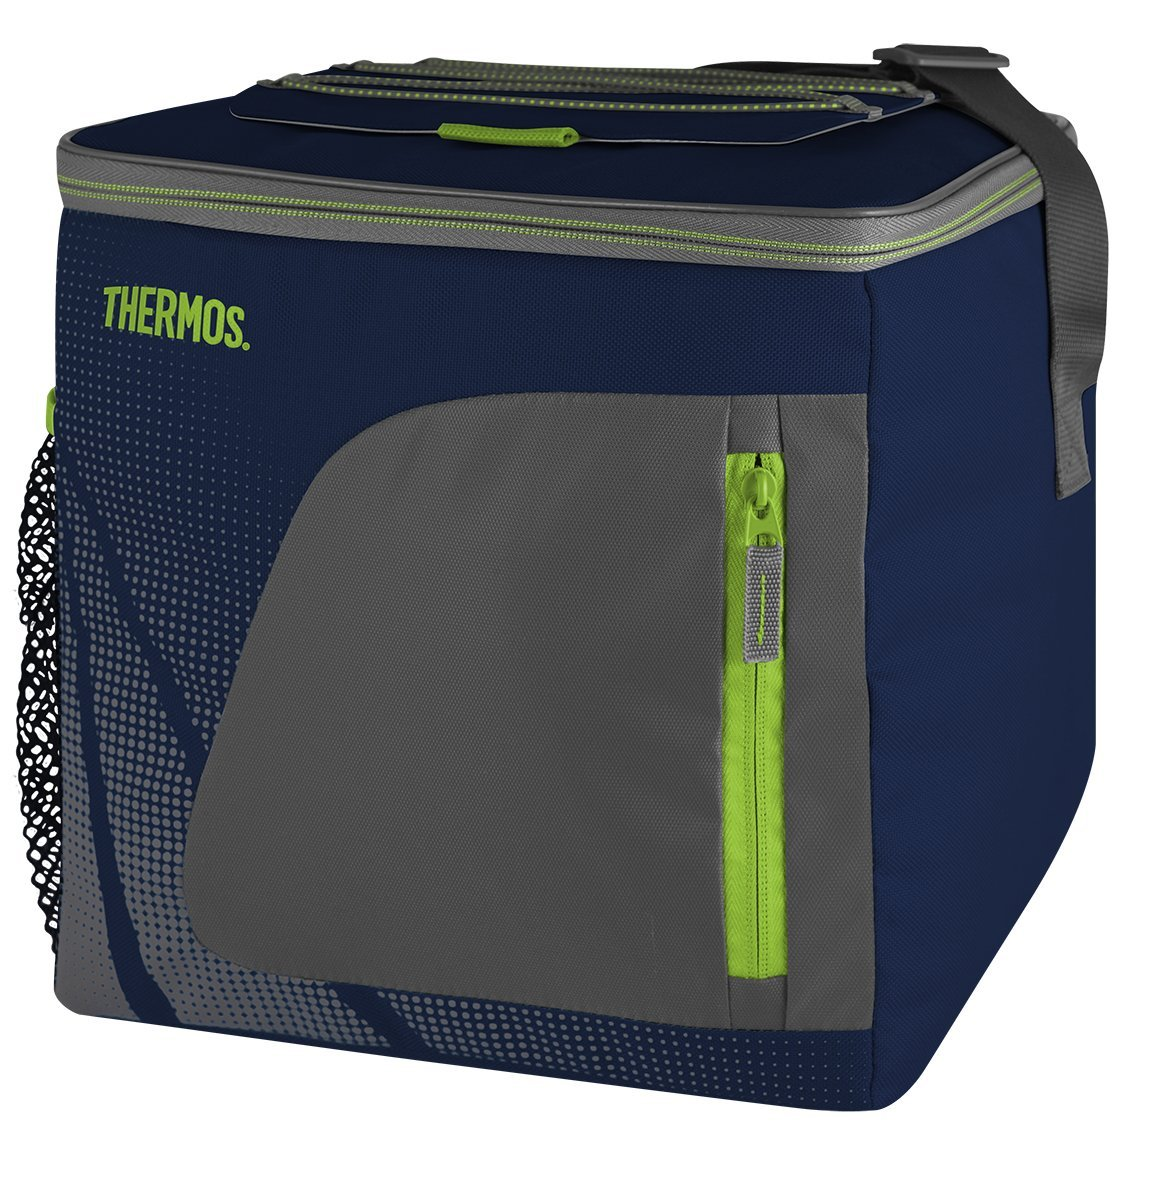 Thermos Radiance Bolsa térmica capacidad para latas color azul